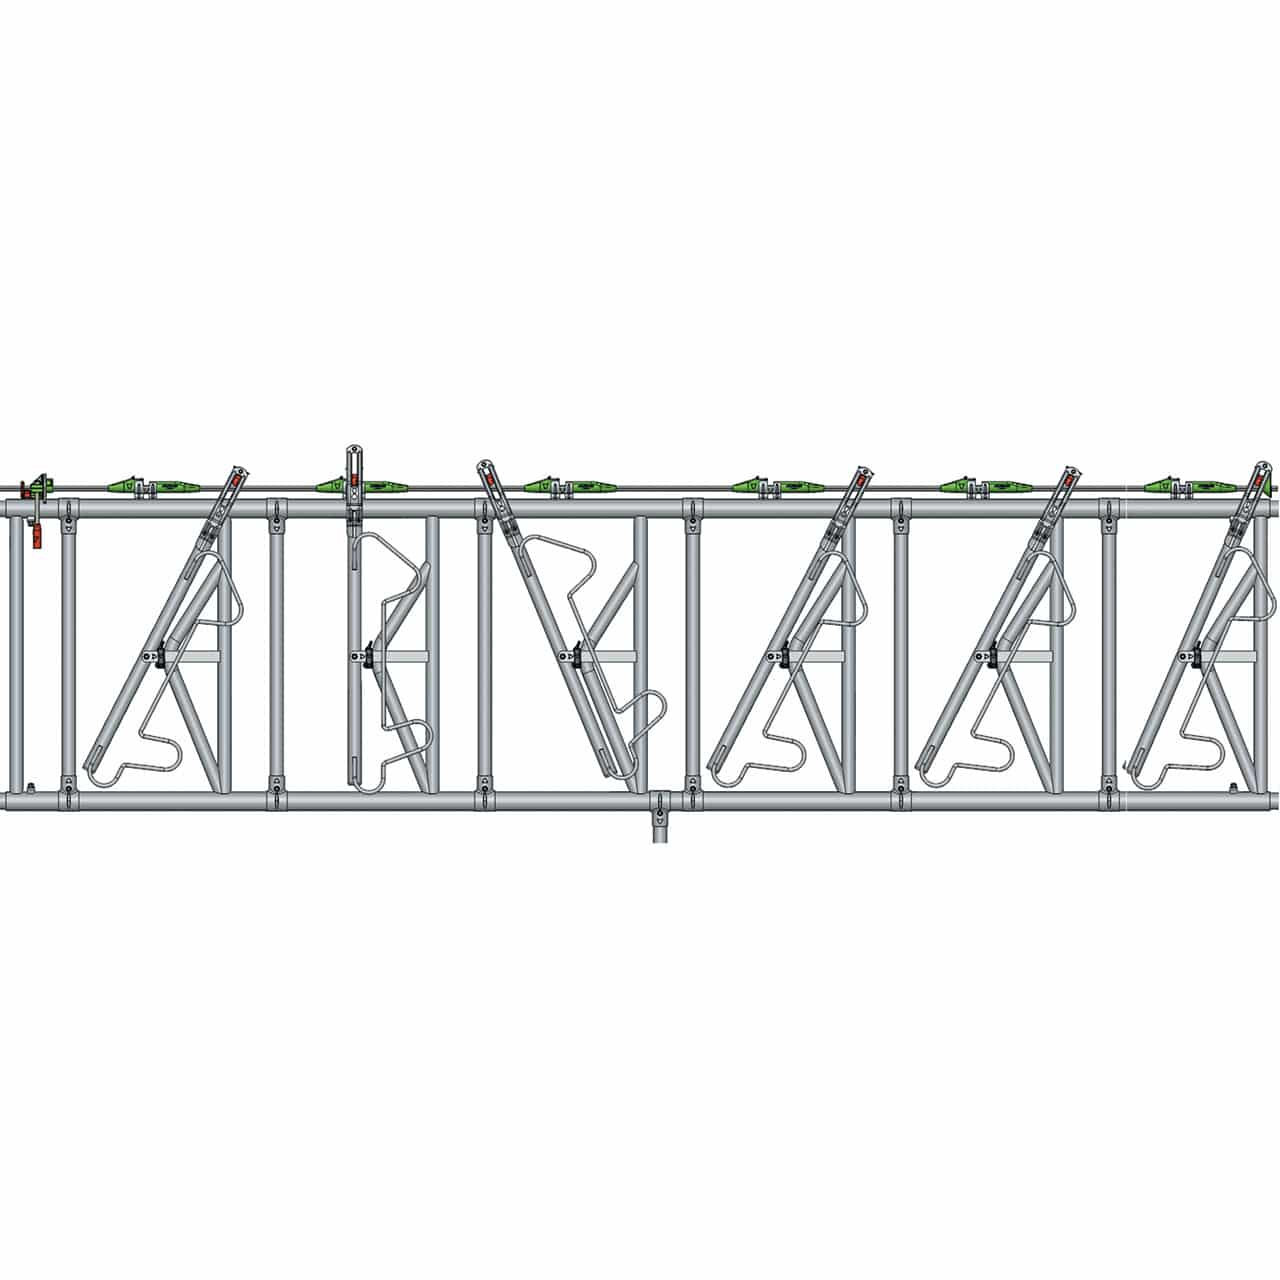 Jourdain Safety-Lock COW Panels | Agromatic Inc